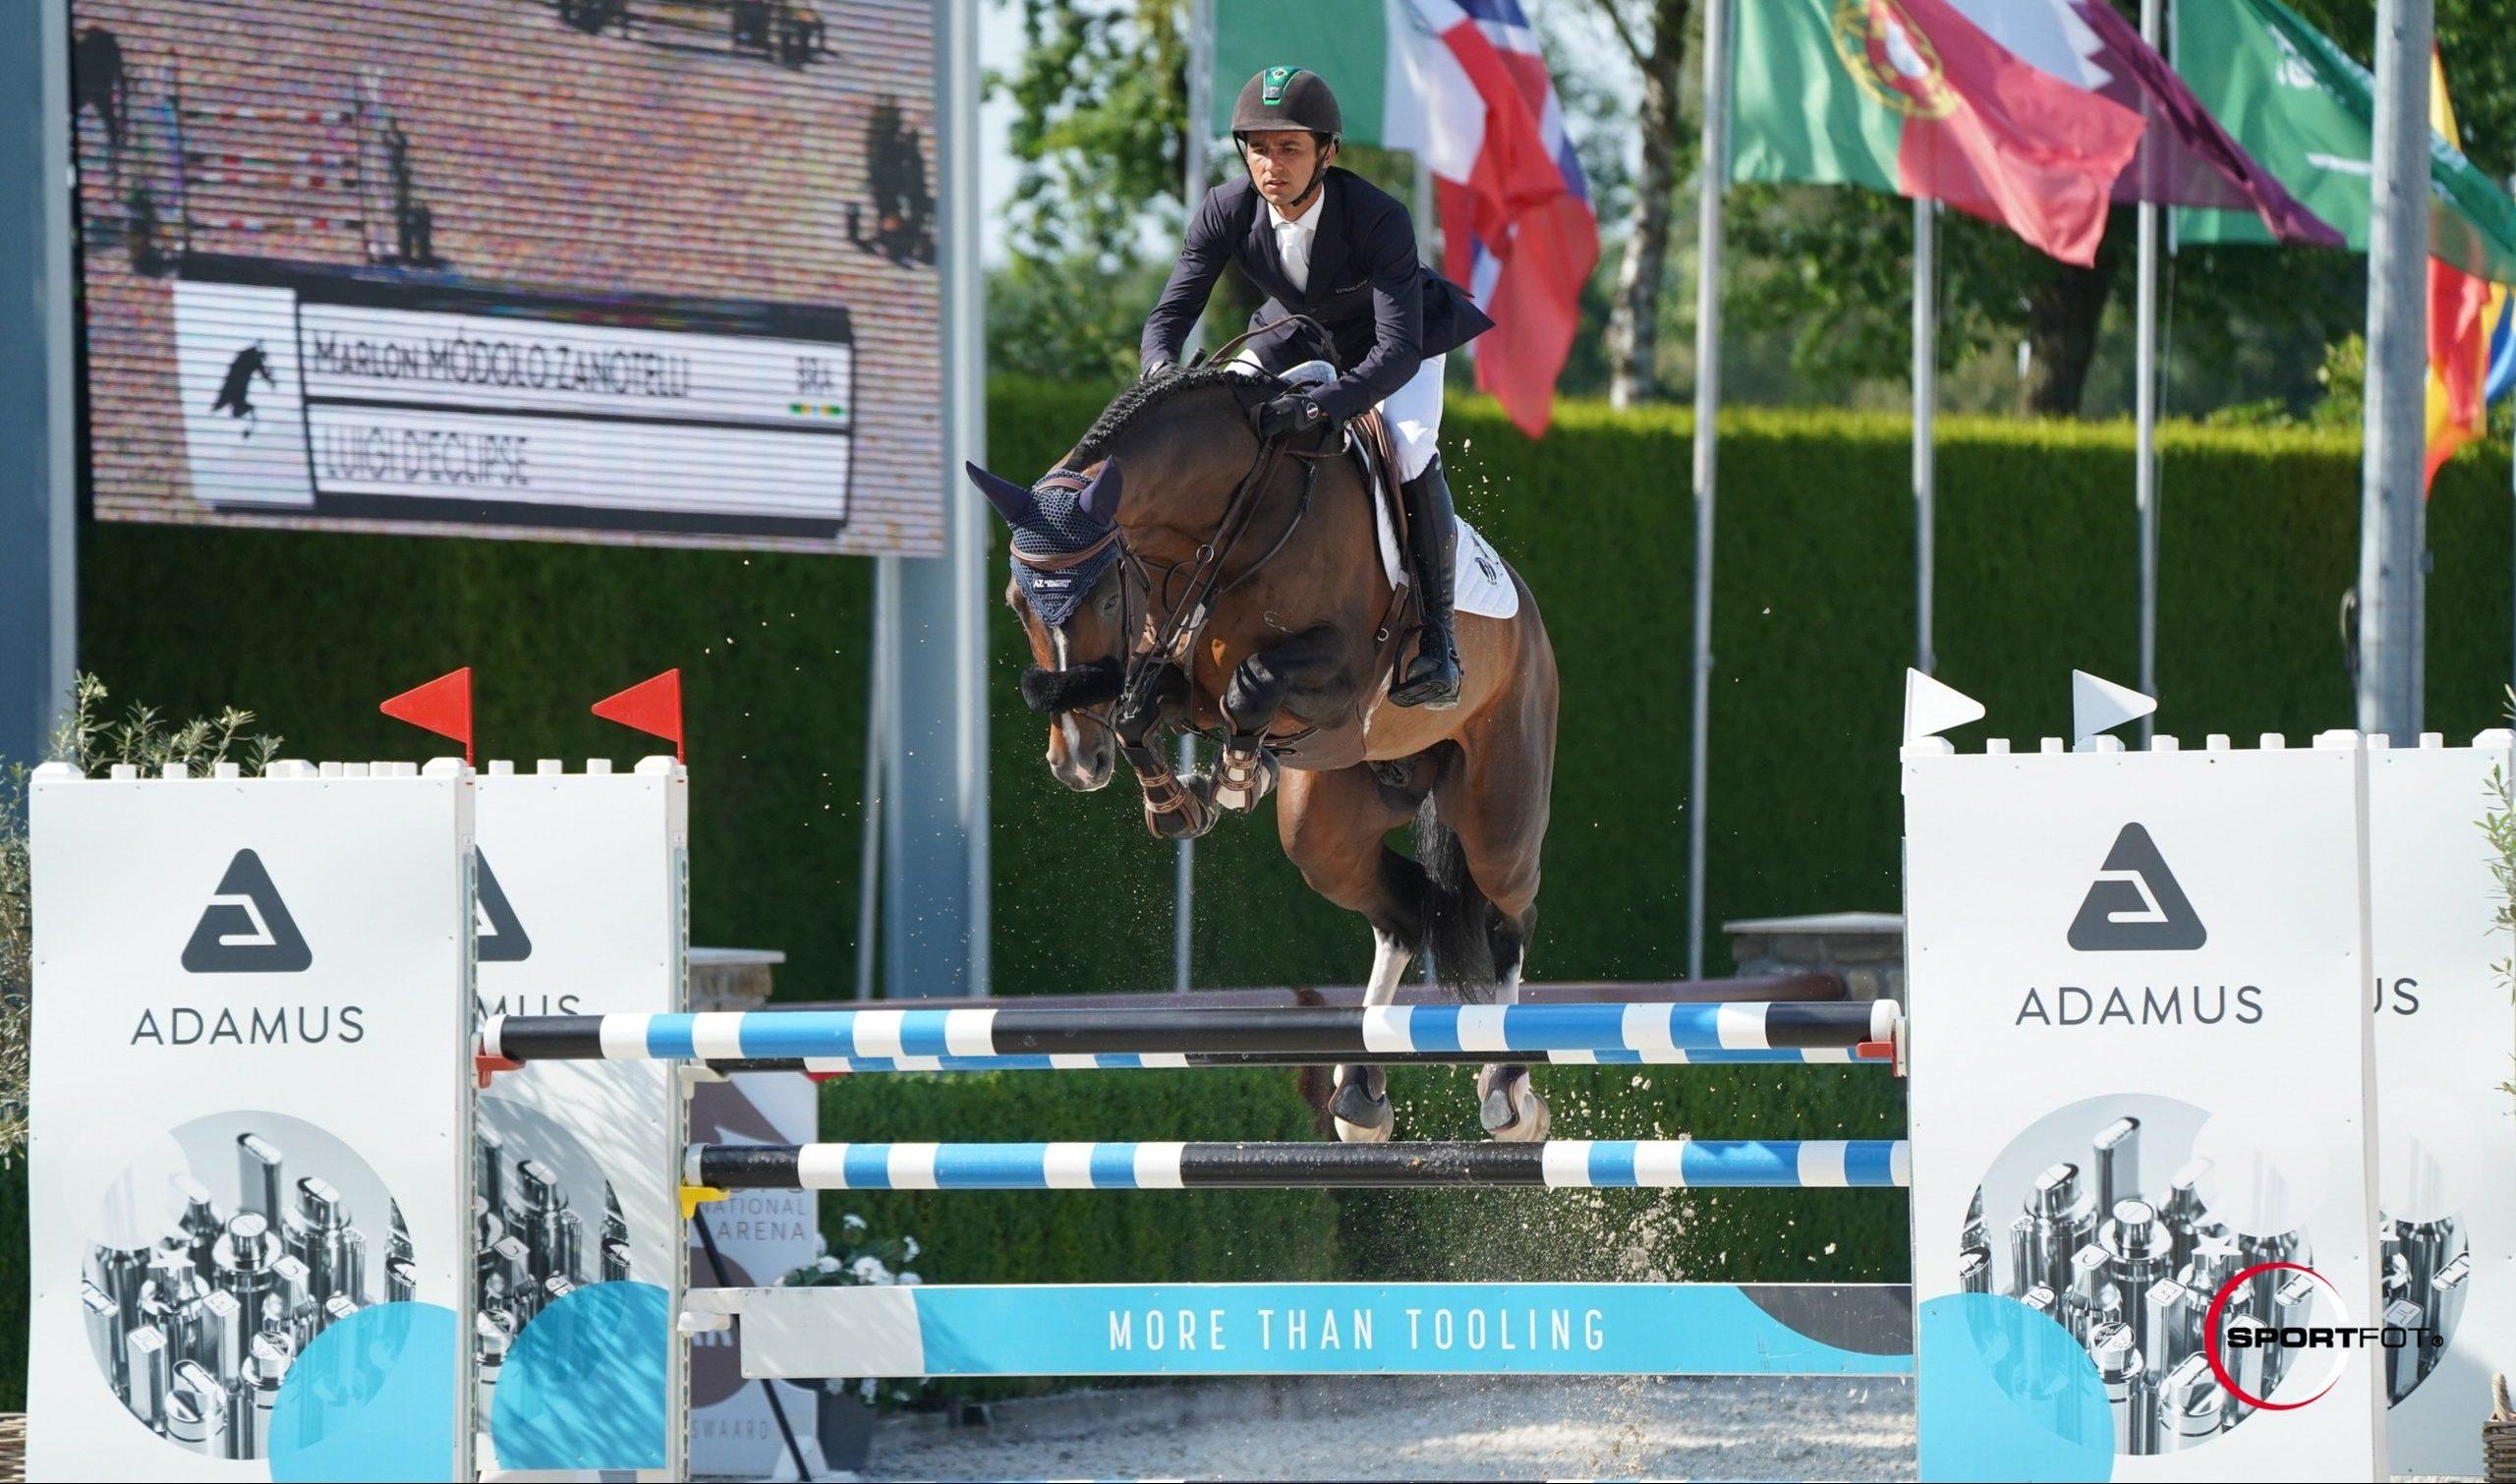 Fantastic start for Luigi D'Eclipse in Valkenswaard